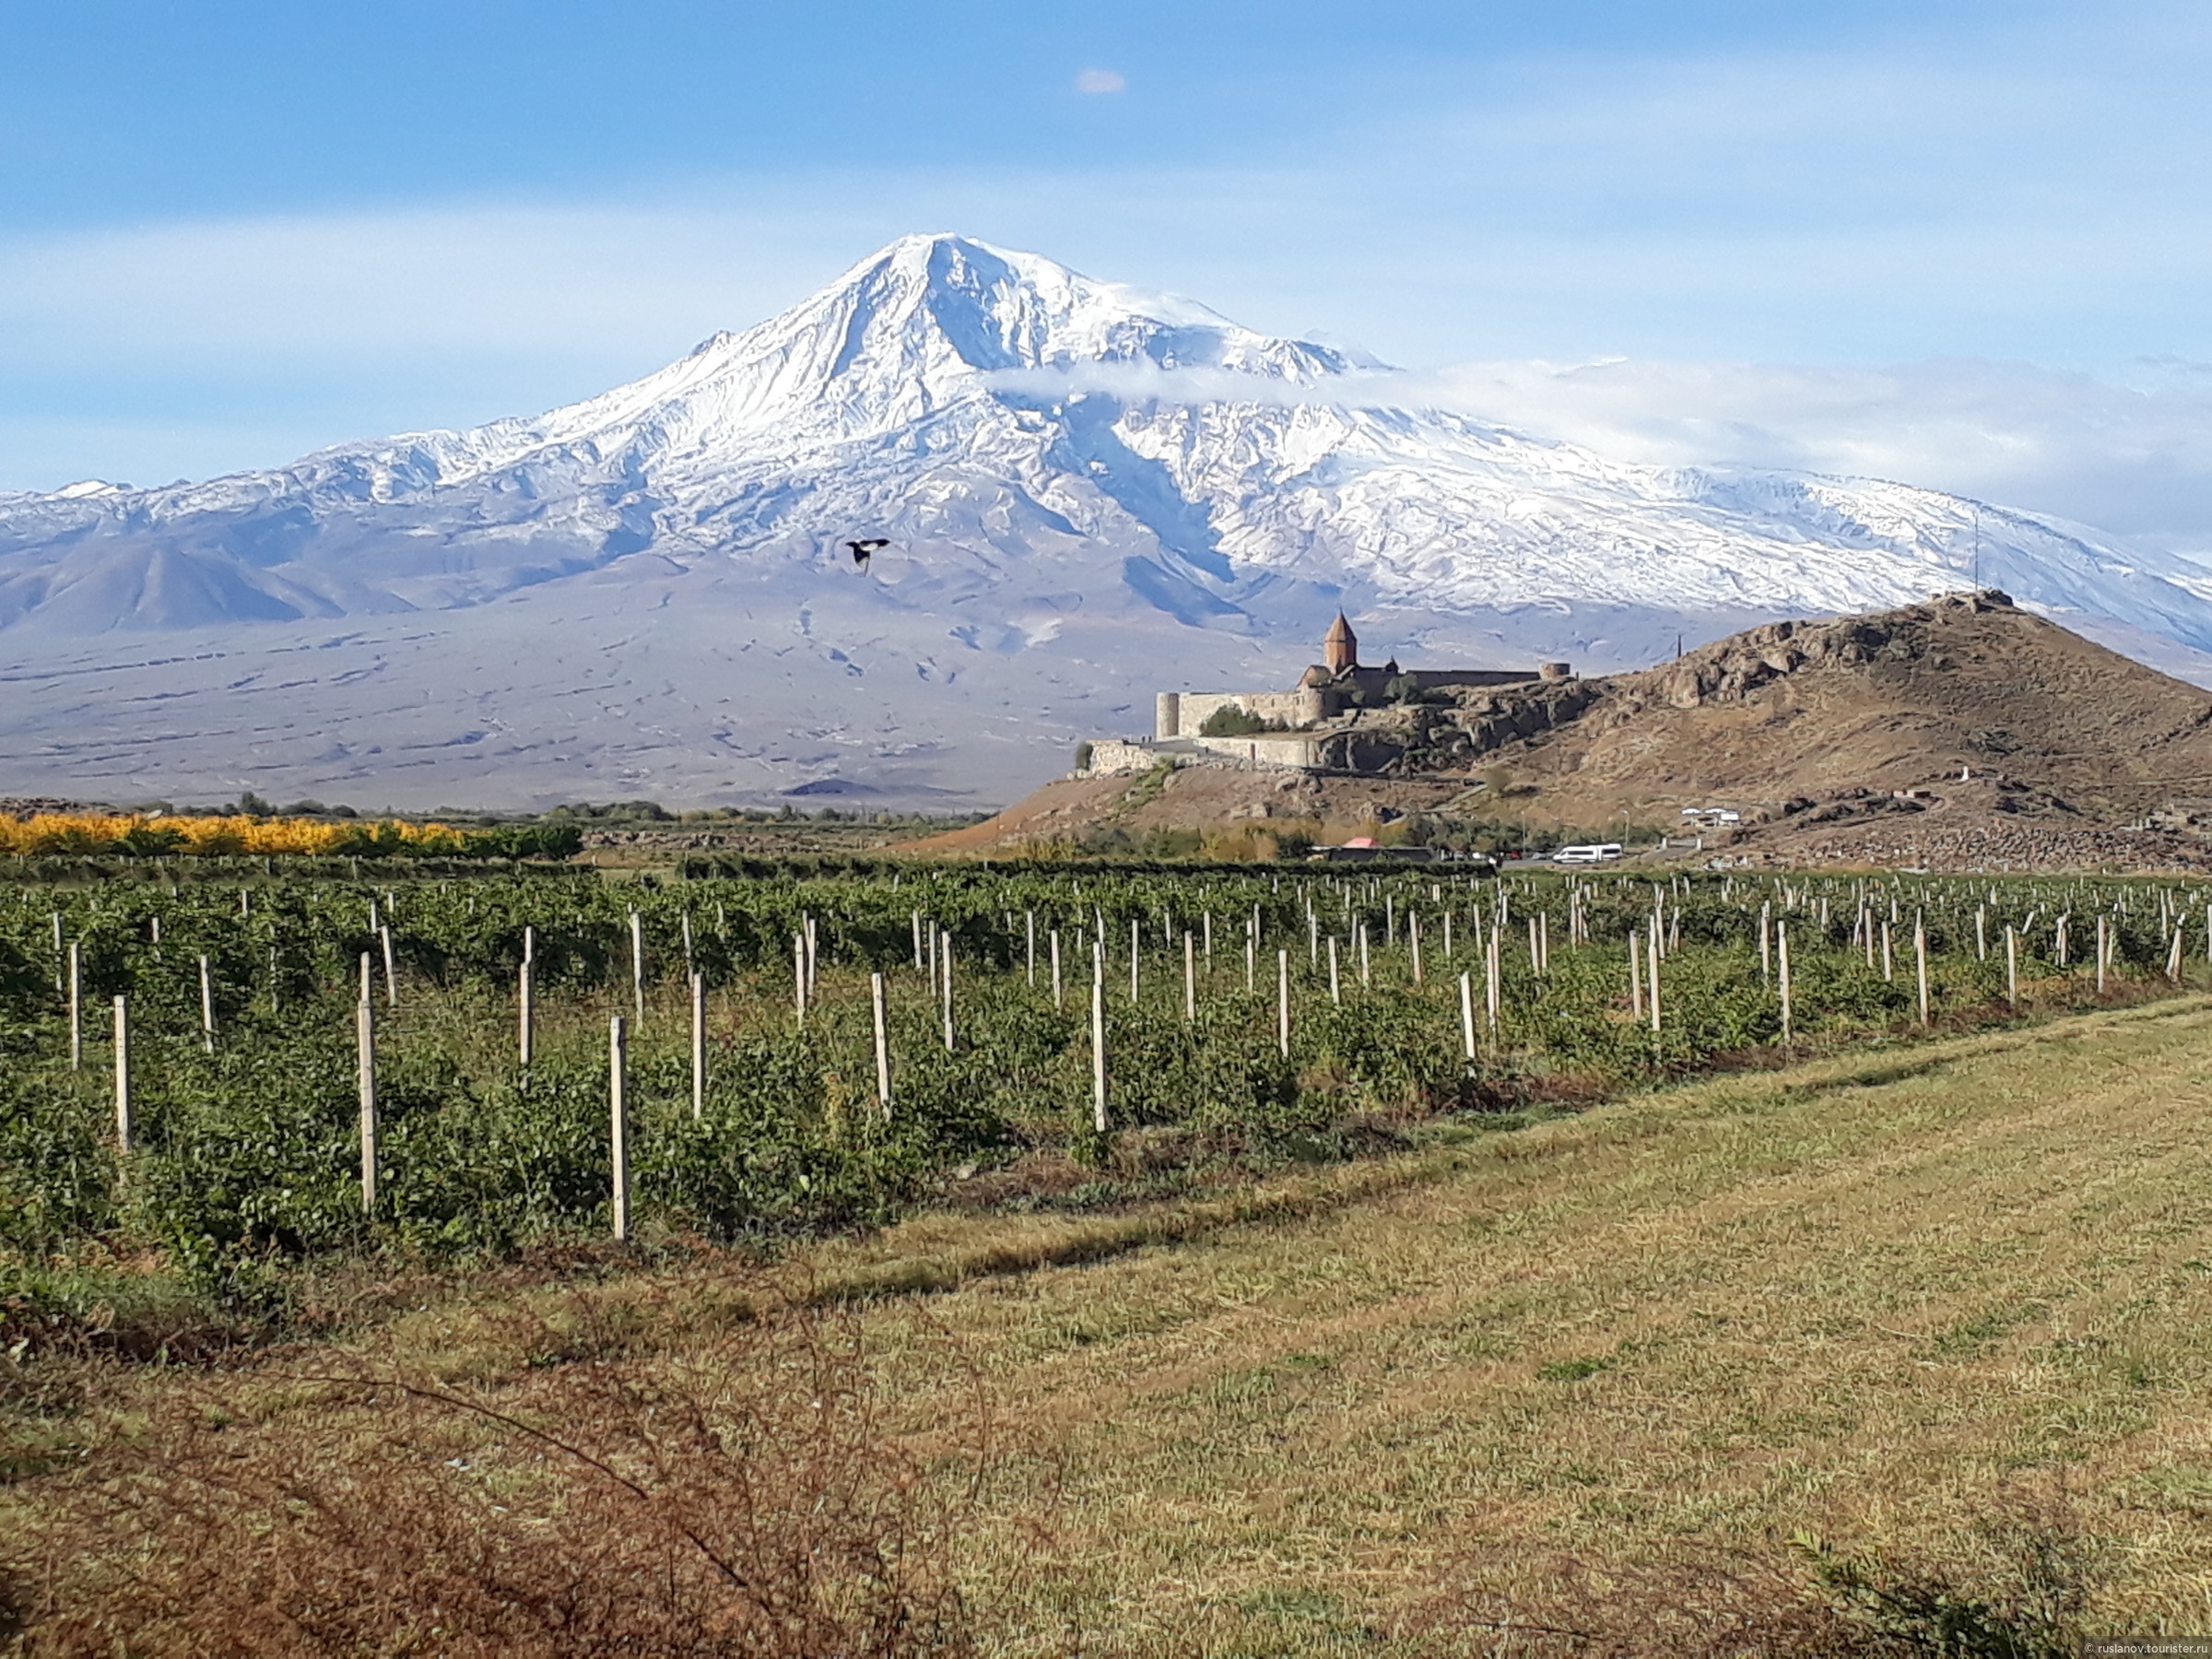 фото горы арарат со стороны армении отдаю